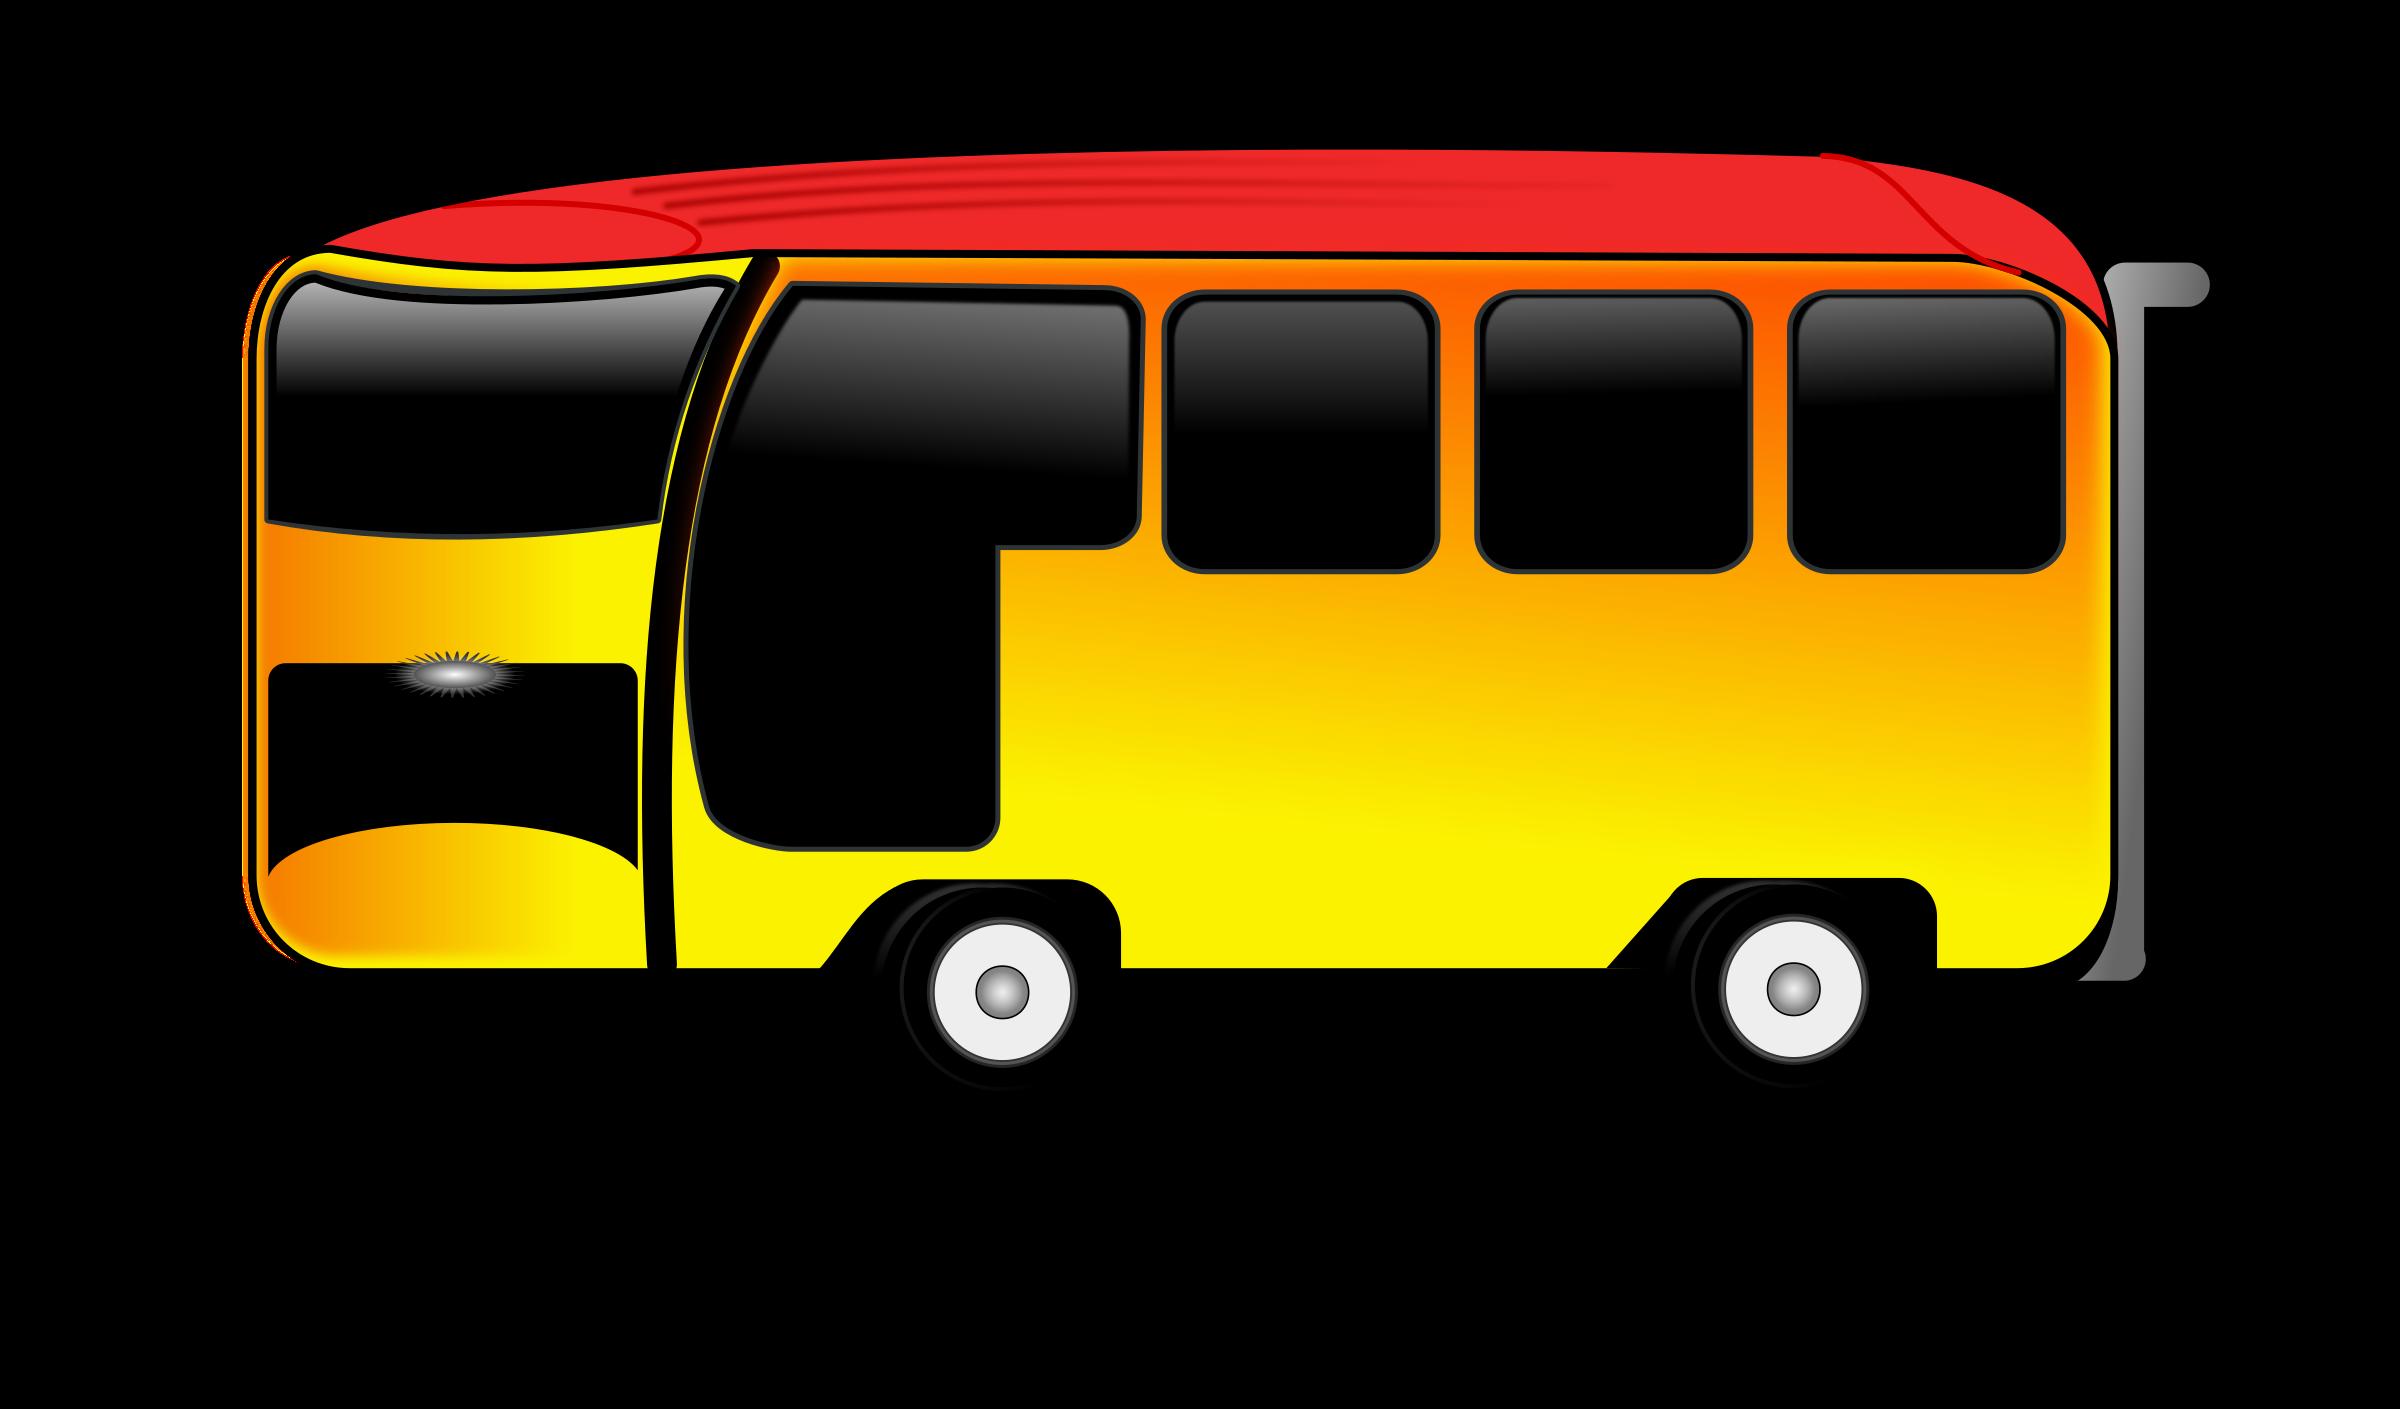 Bus big image png. Land clipart cartoon